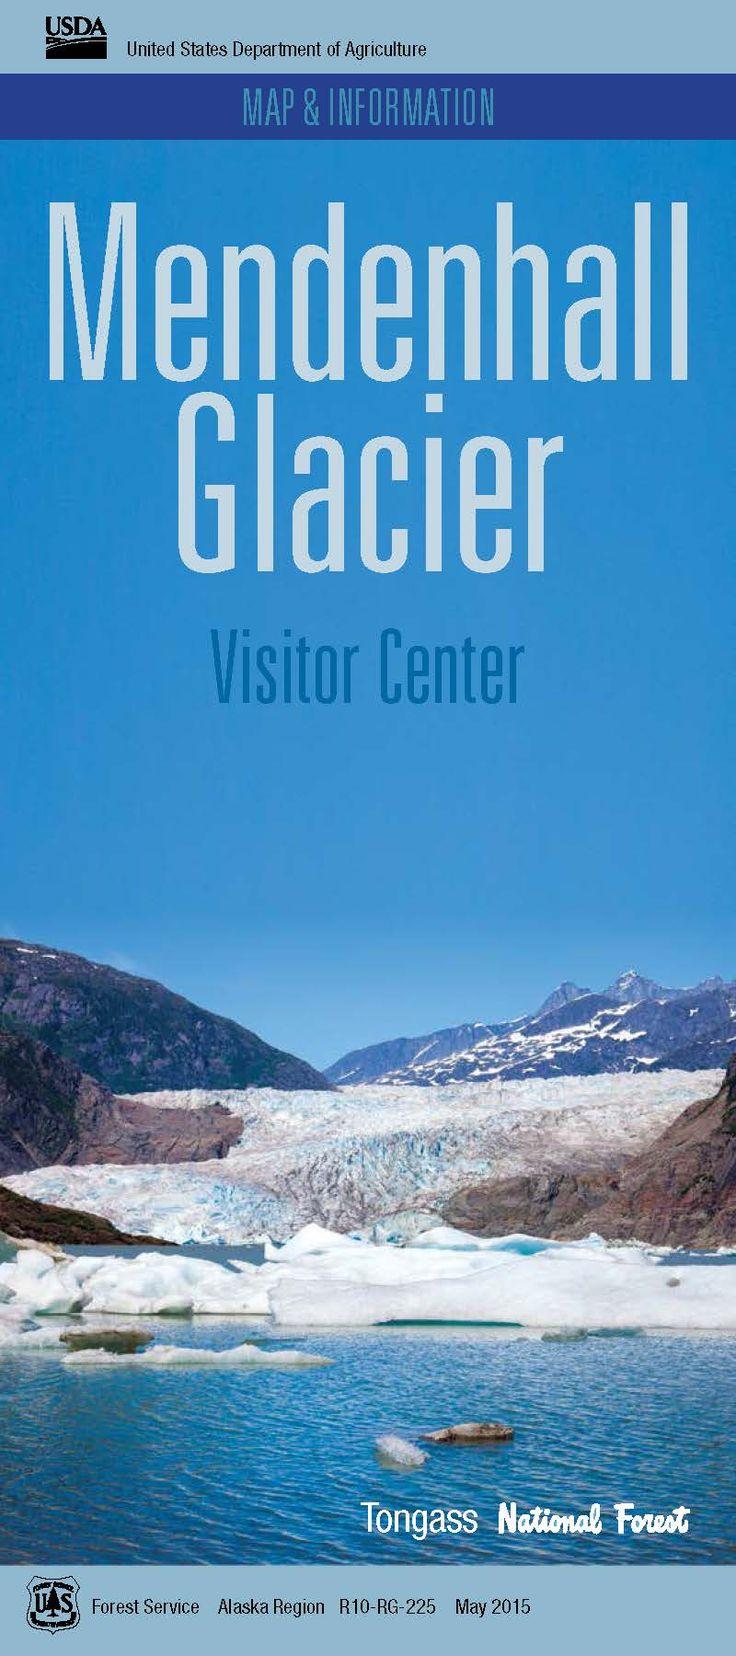 Alaska Major Cities Map%0A Mendenhall Glacier Recreation Area Map  u     Information Front Page